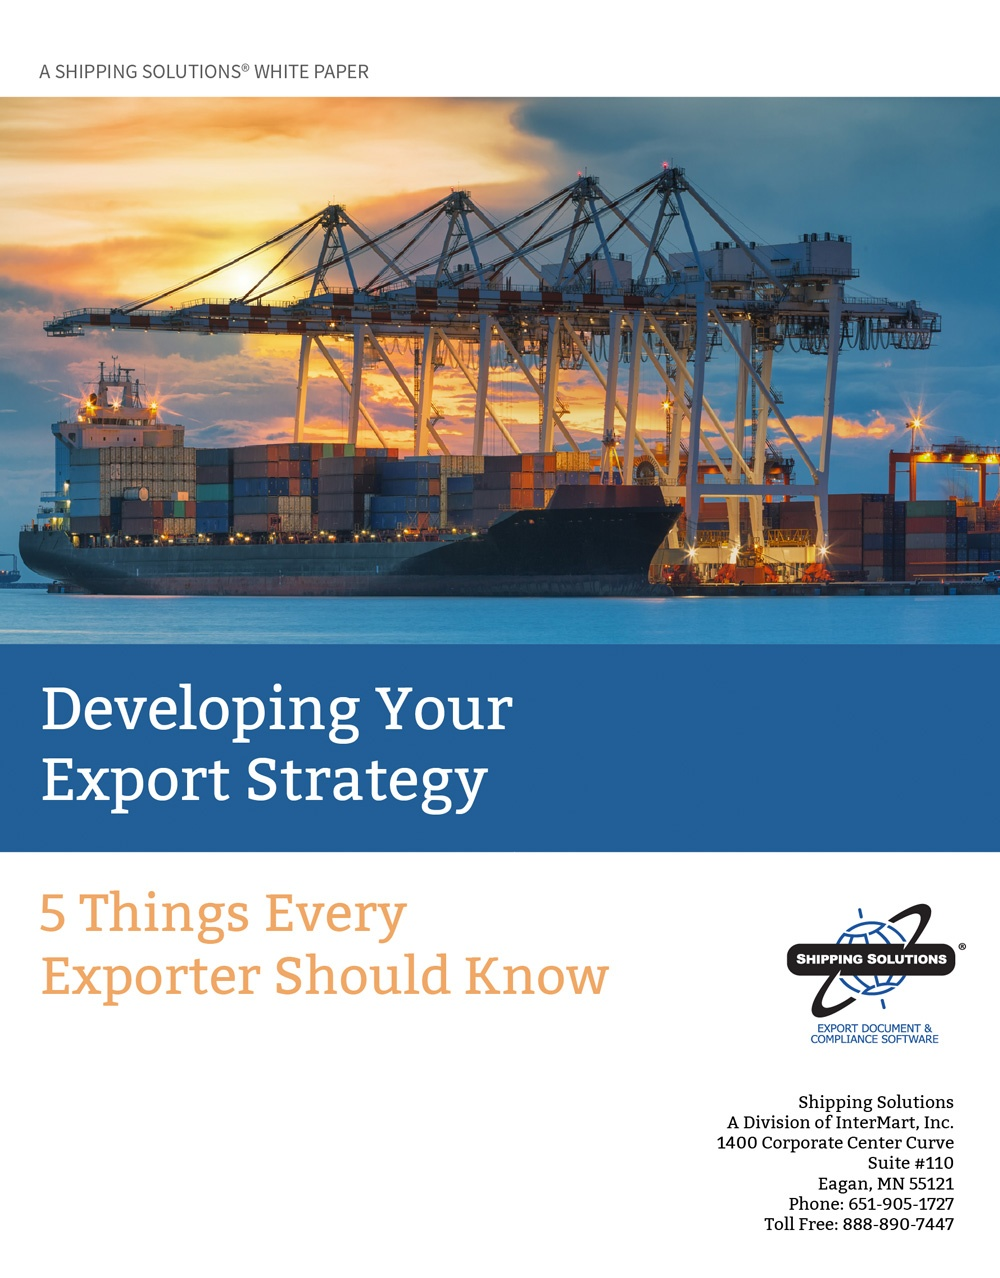 LPThumbnail-DevelopingYourExportStrategy-ShippingSolutions.jpg